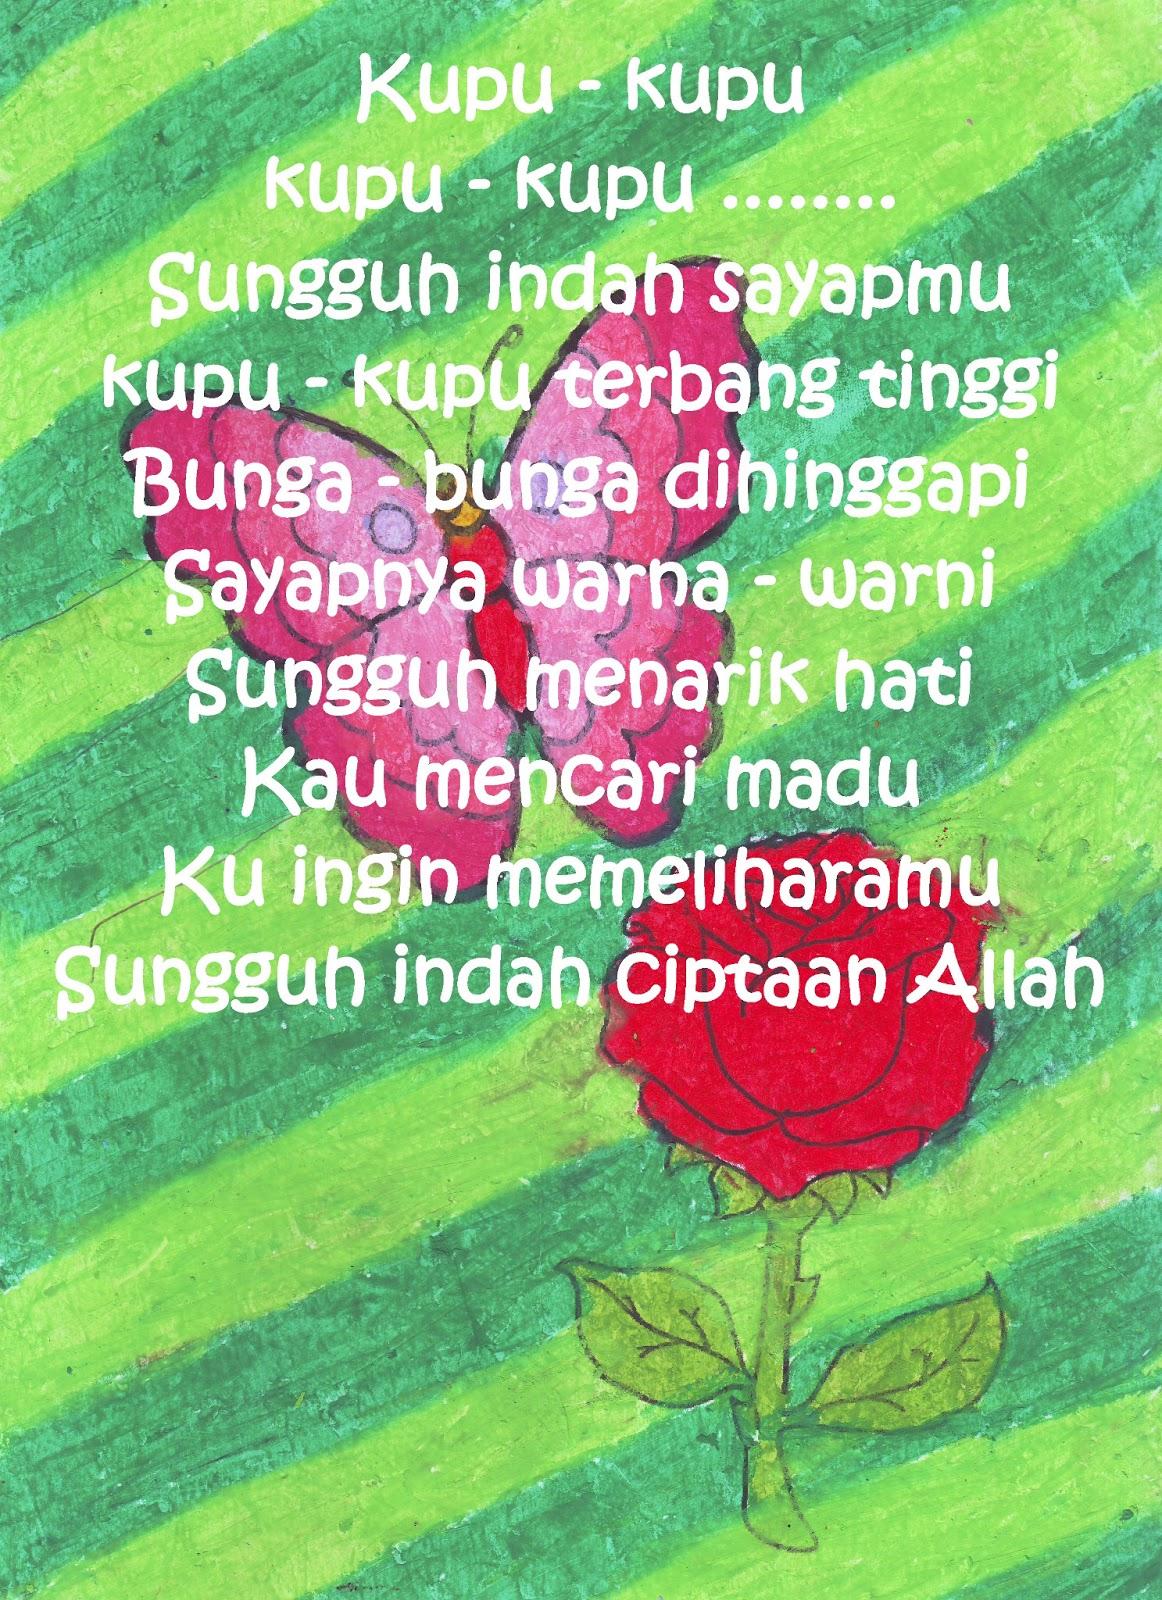 kumpulan puisi cinta related keywords   kumpulan puisi